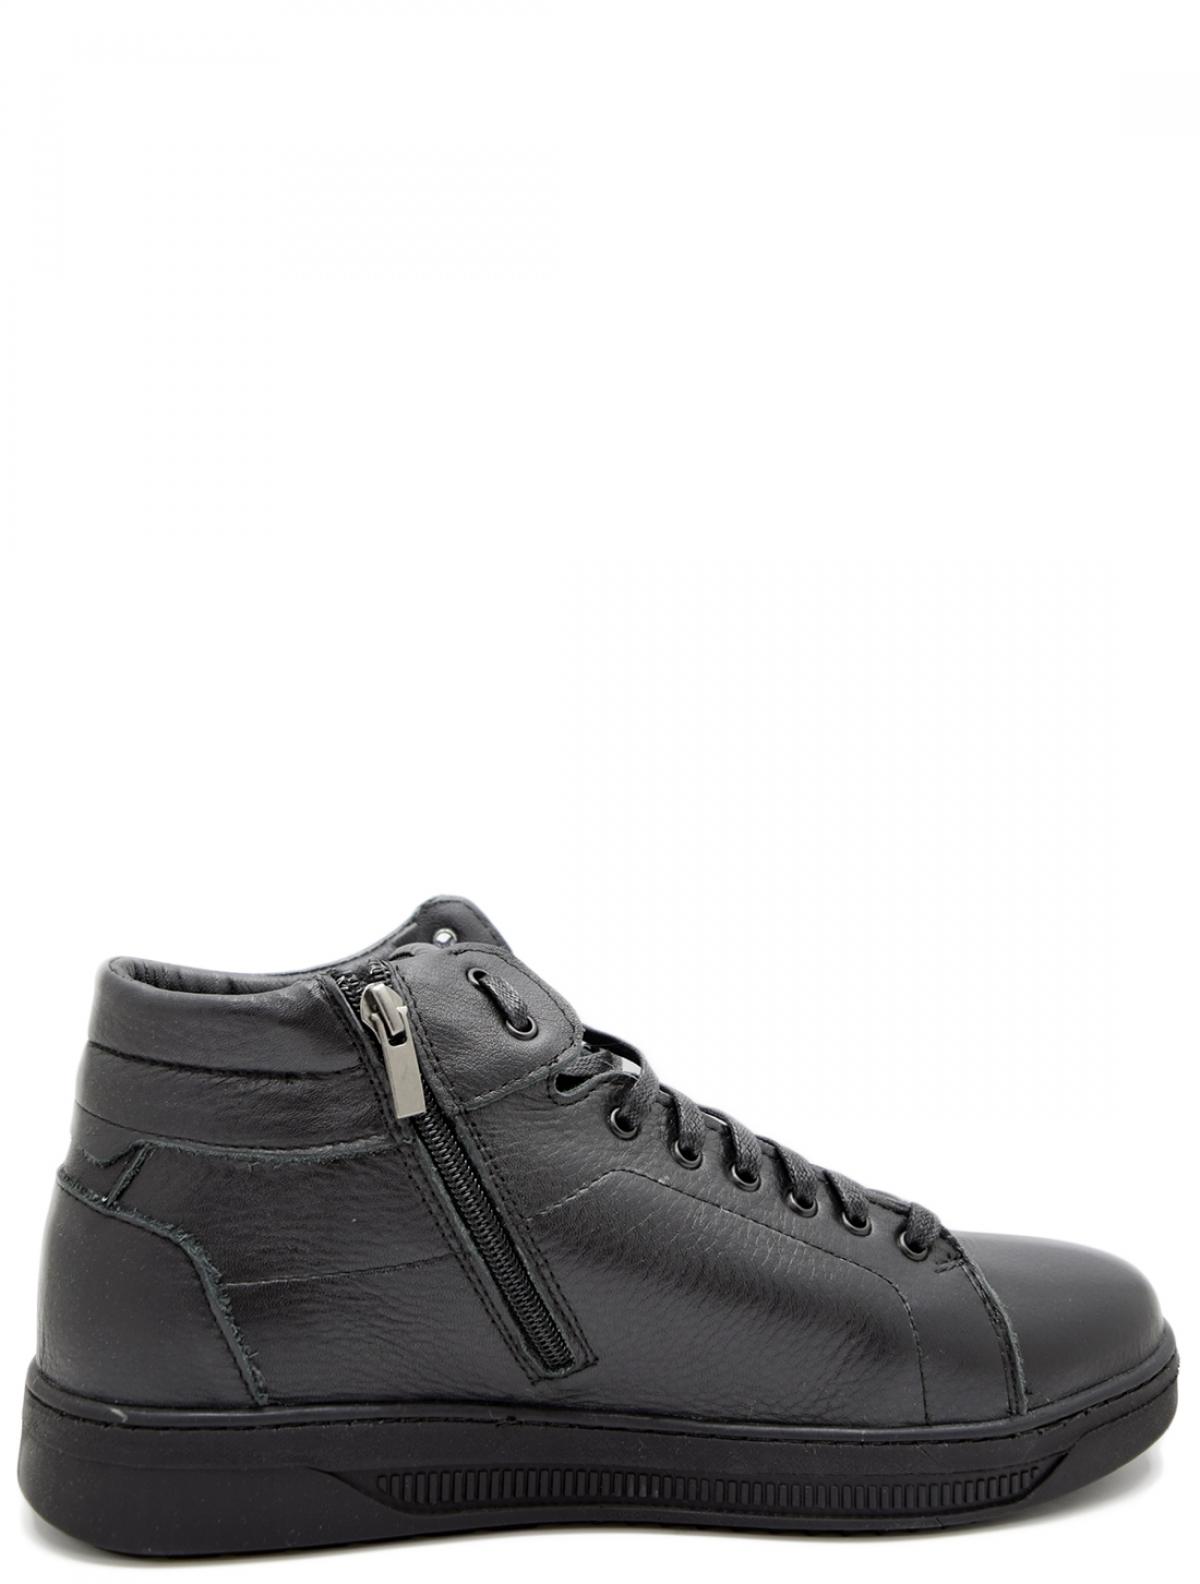 BERTOLI 217/44Ш мужские ботинки